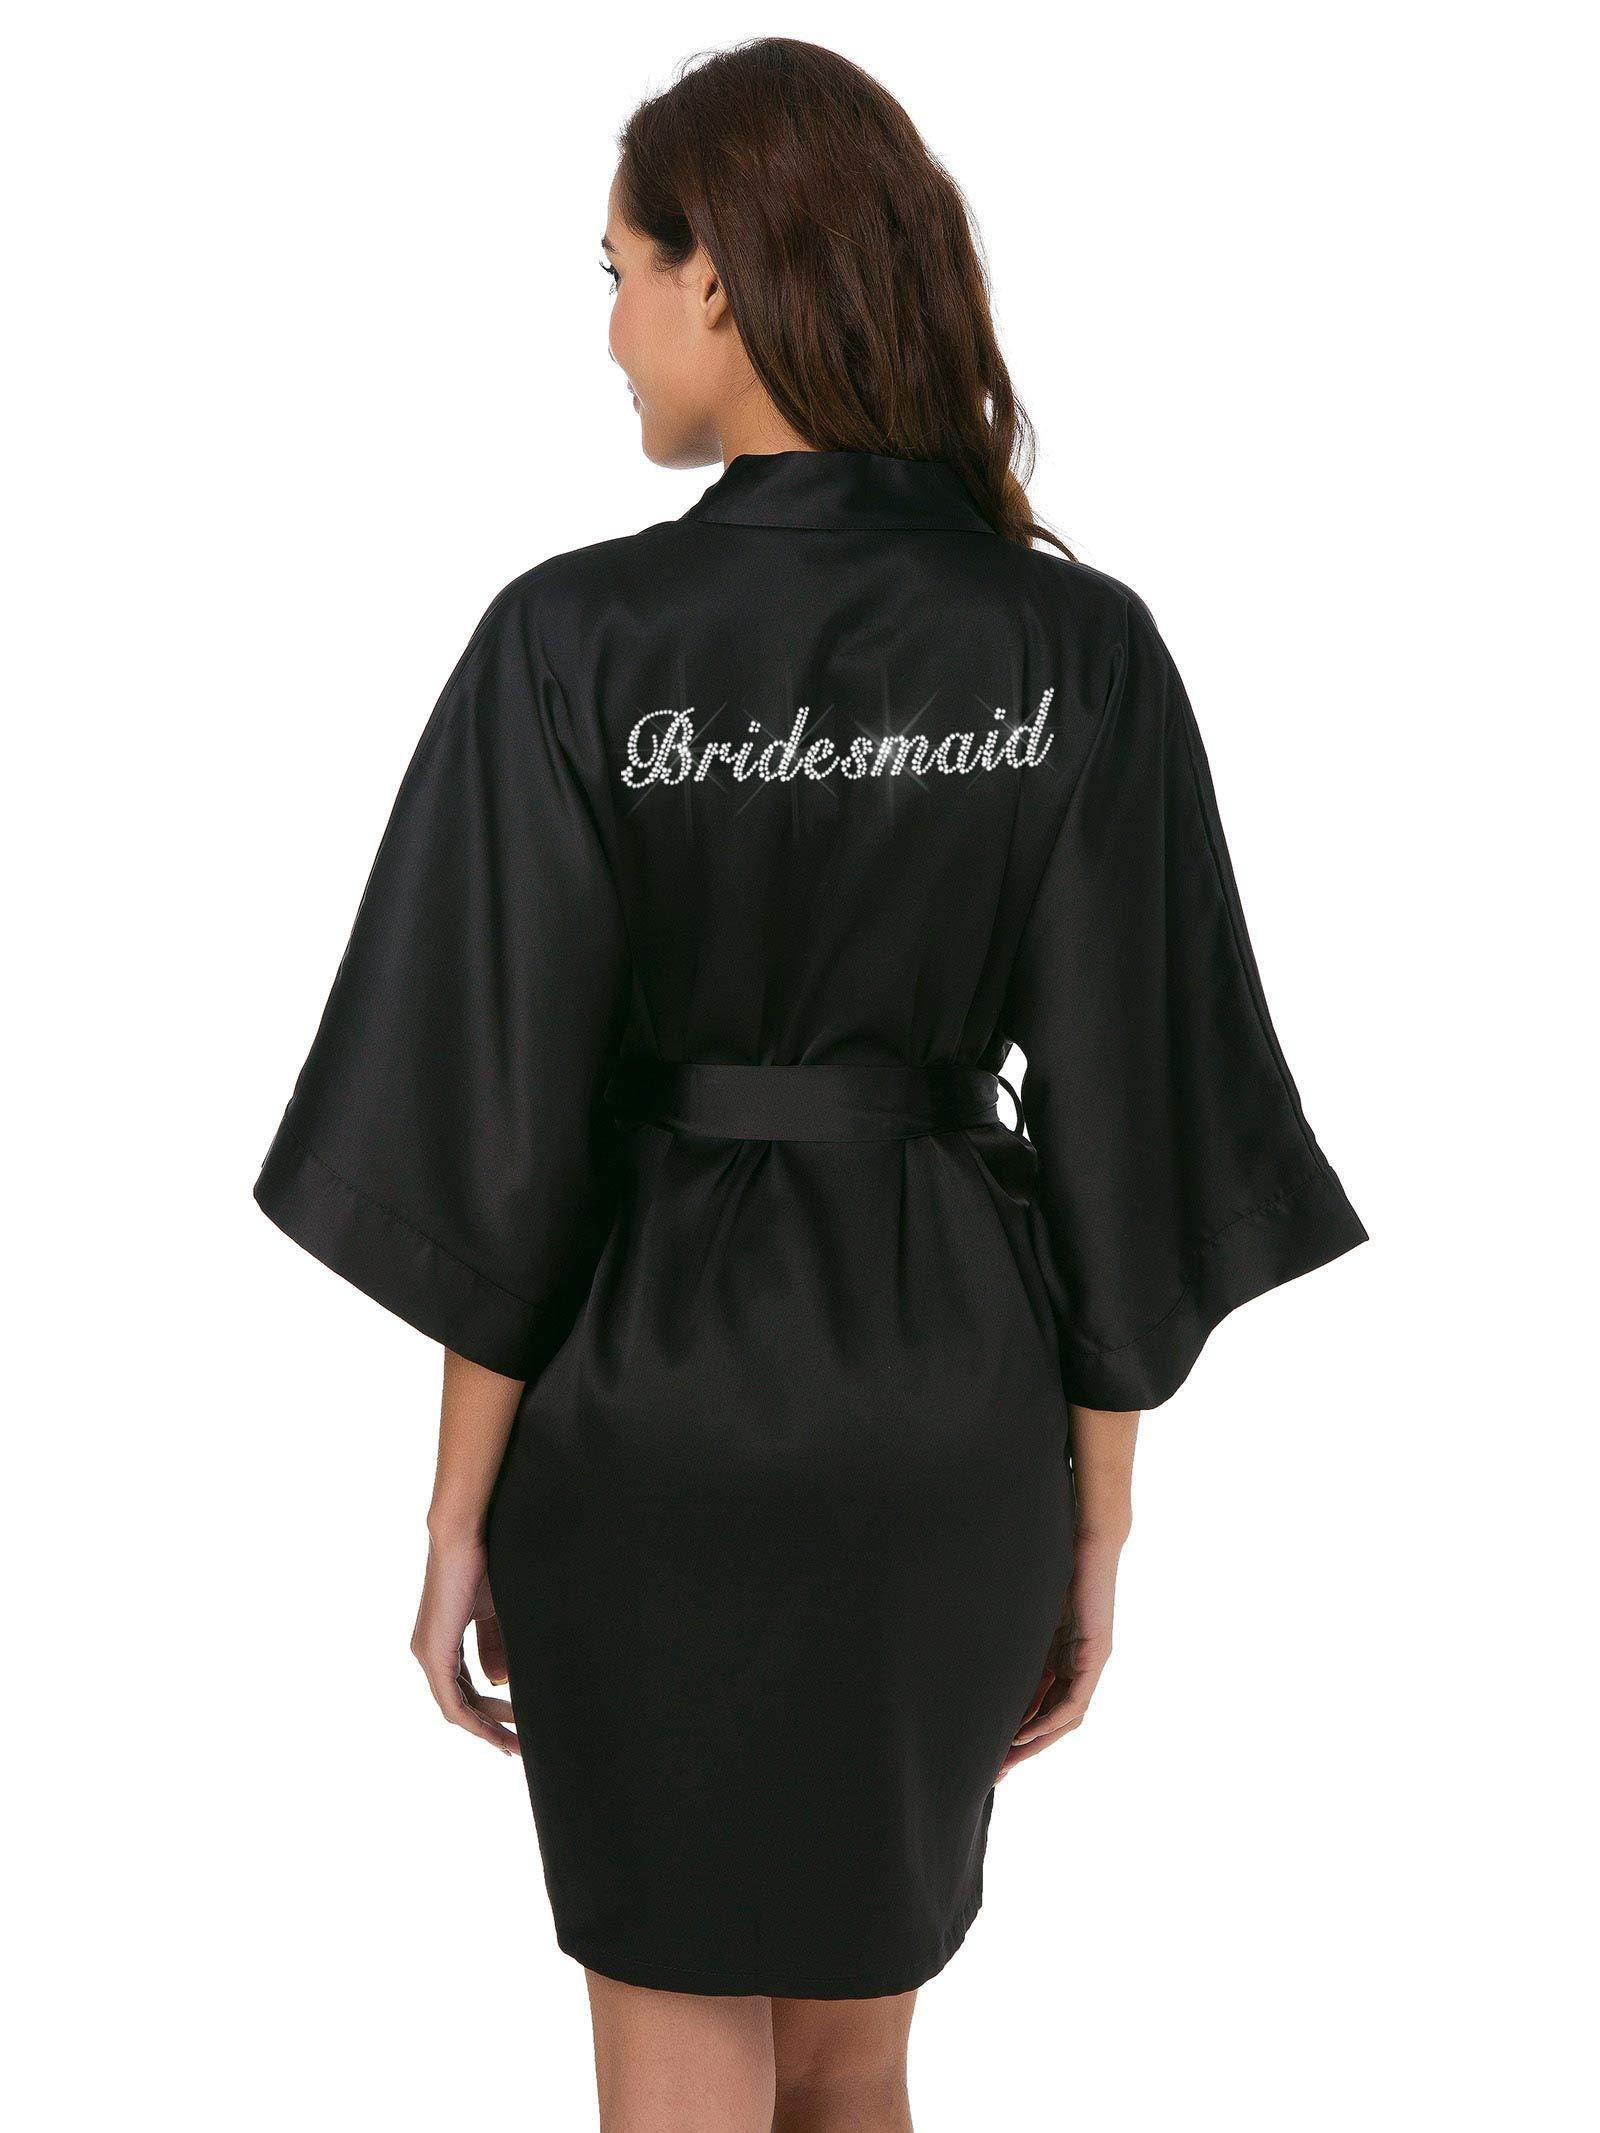 SIORO Personalized Bride Bridesmaid Robes,Womens Satin Bathrobe for Wedding Party